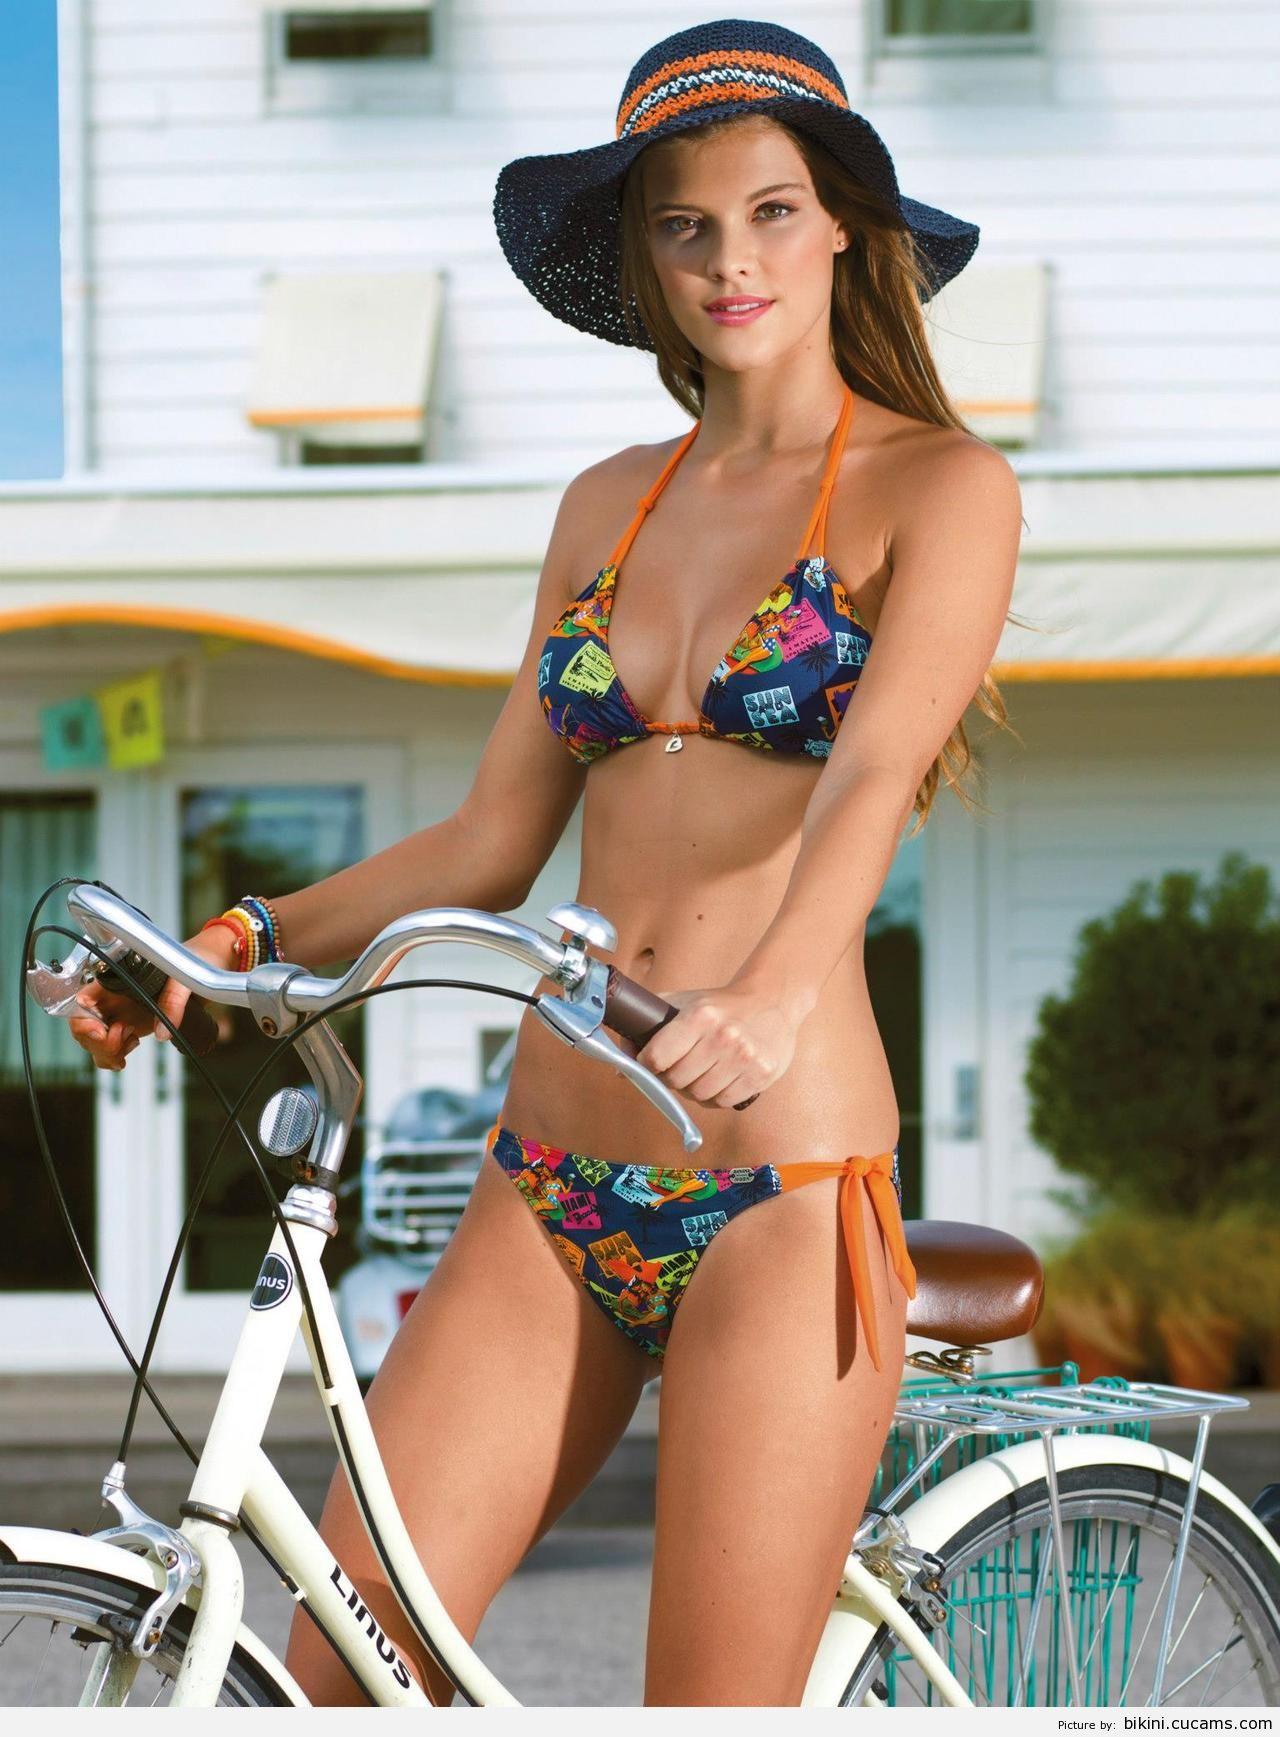 Bikini Colombian Hot by bikini.cucams.com